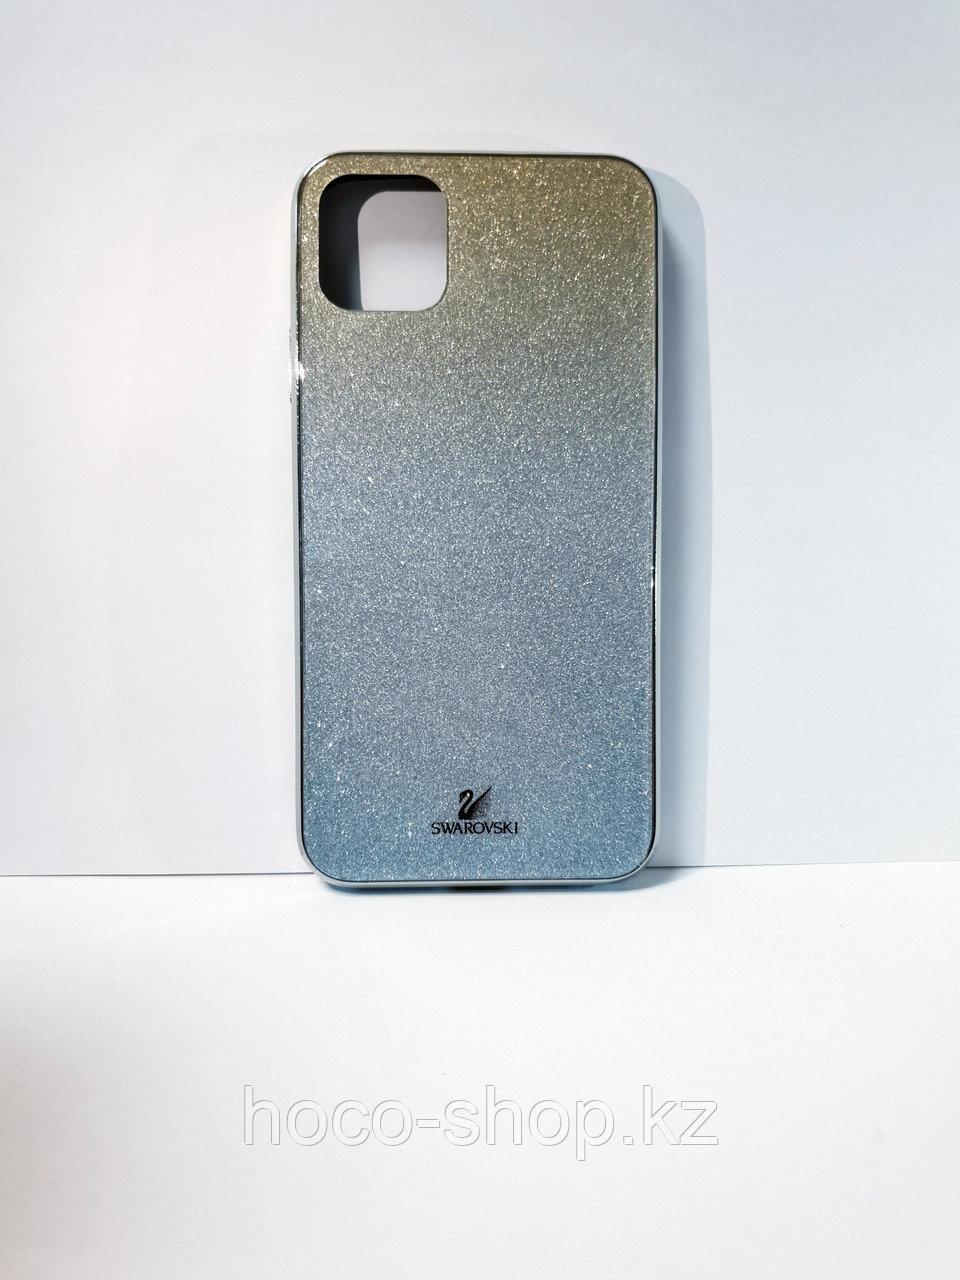 Чехол Swarovski iPhone 11 Pro Max